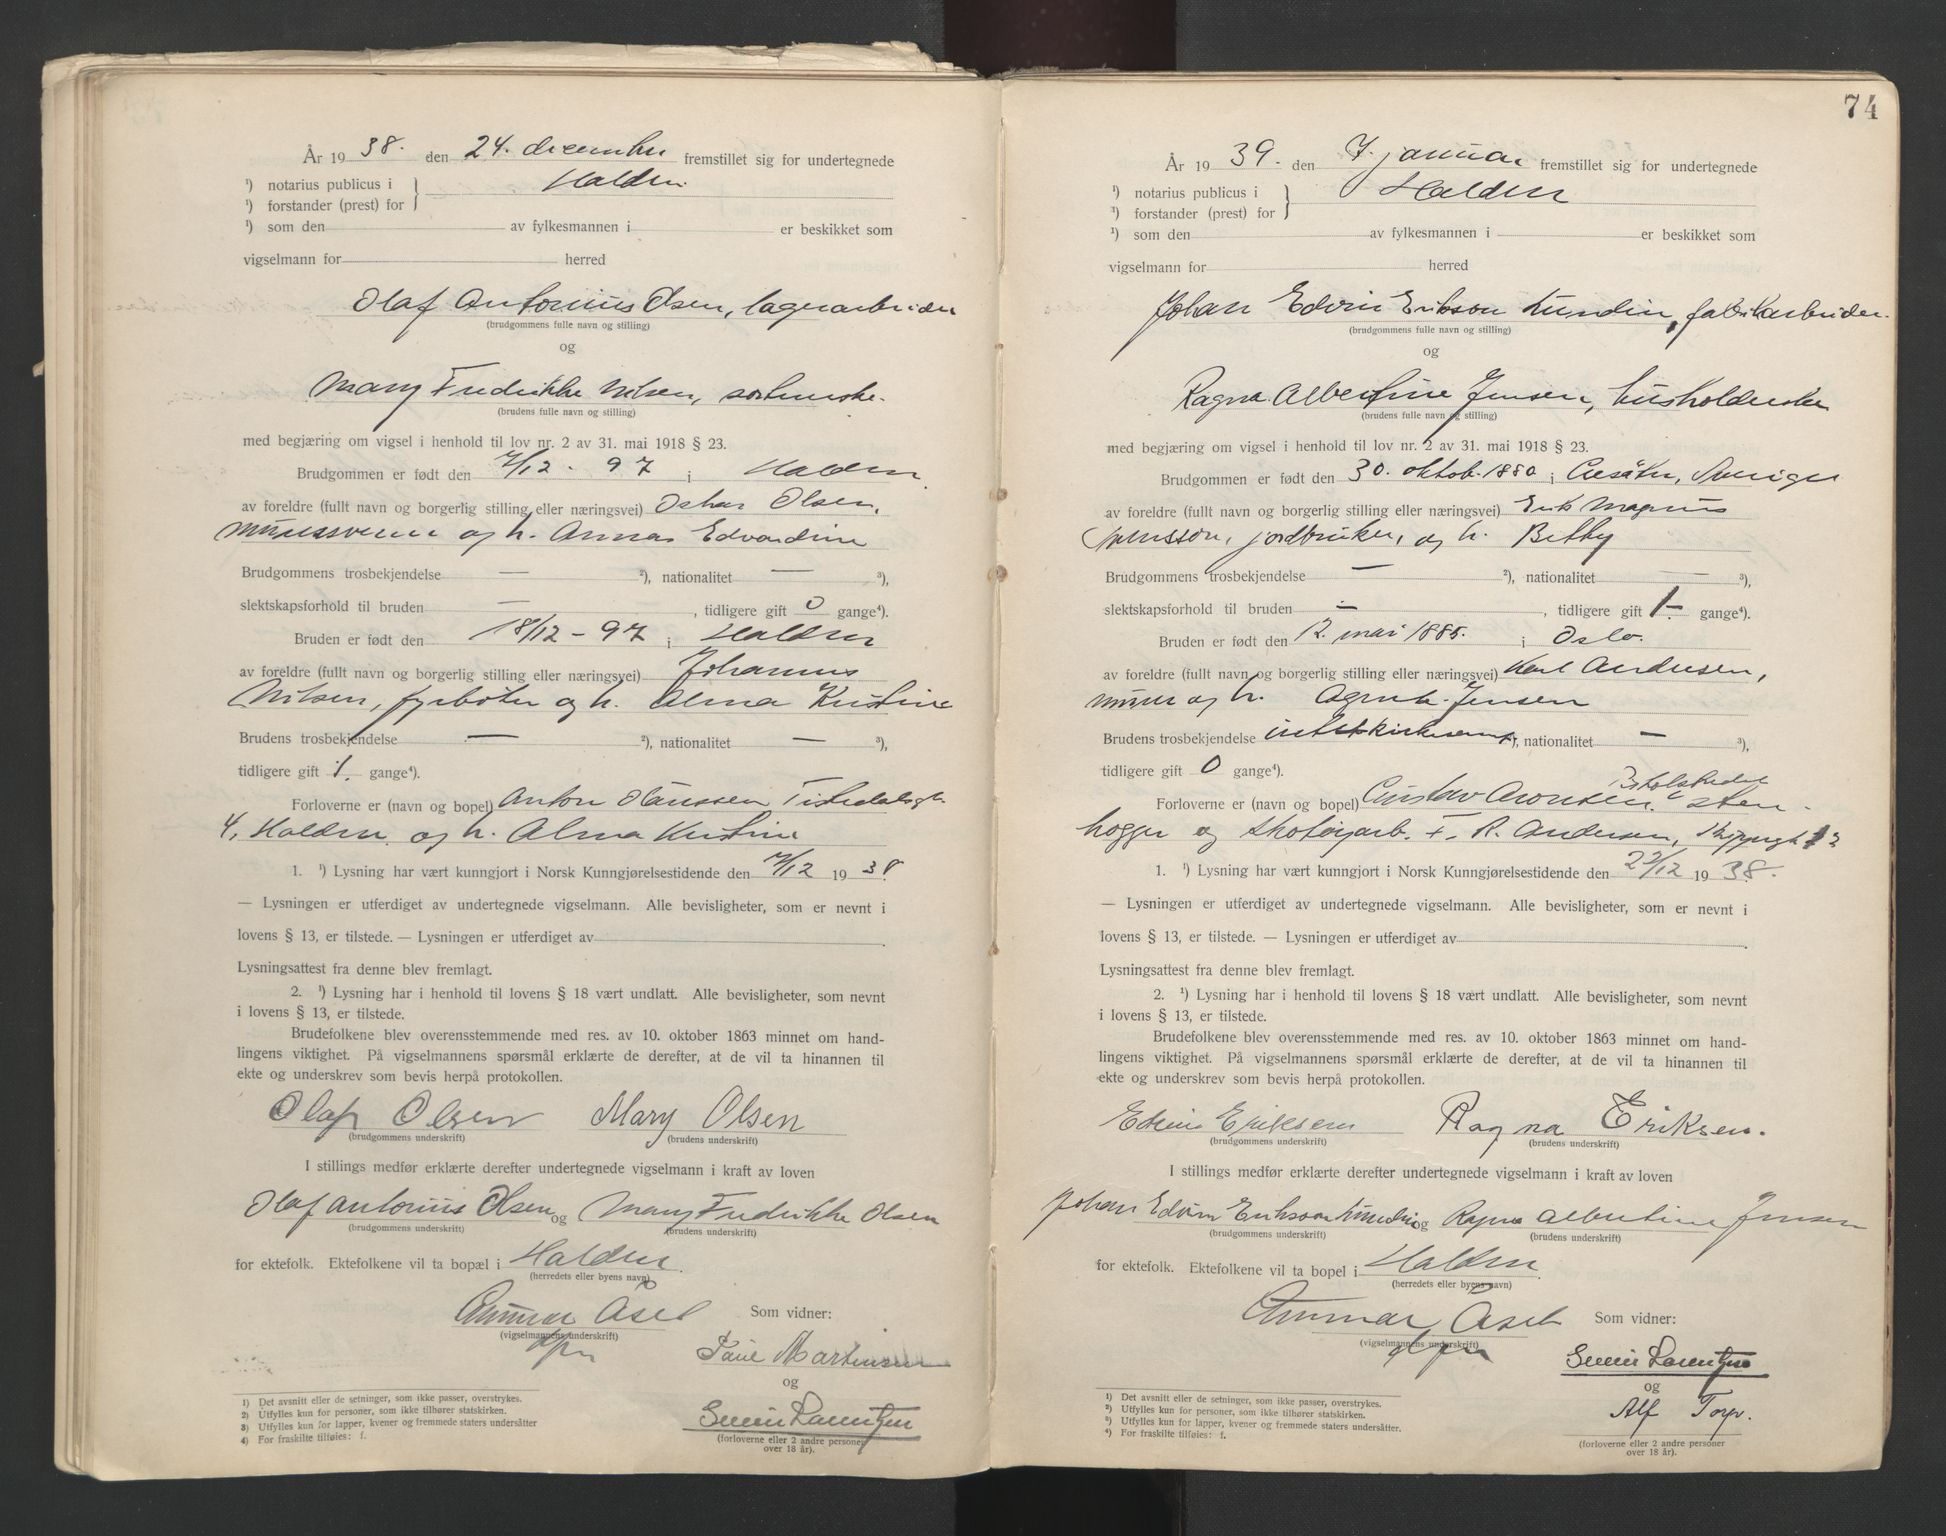 SAO, Idd og Marker sorenskriveri, L/Lc/L0001: Vigselsbøker, 1920-1942, s. 74